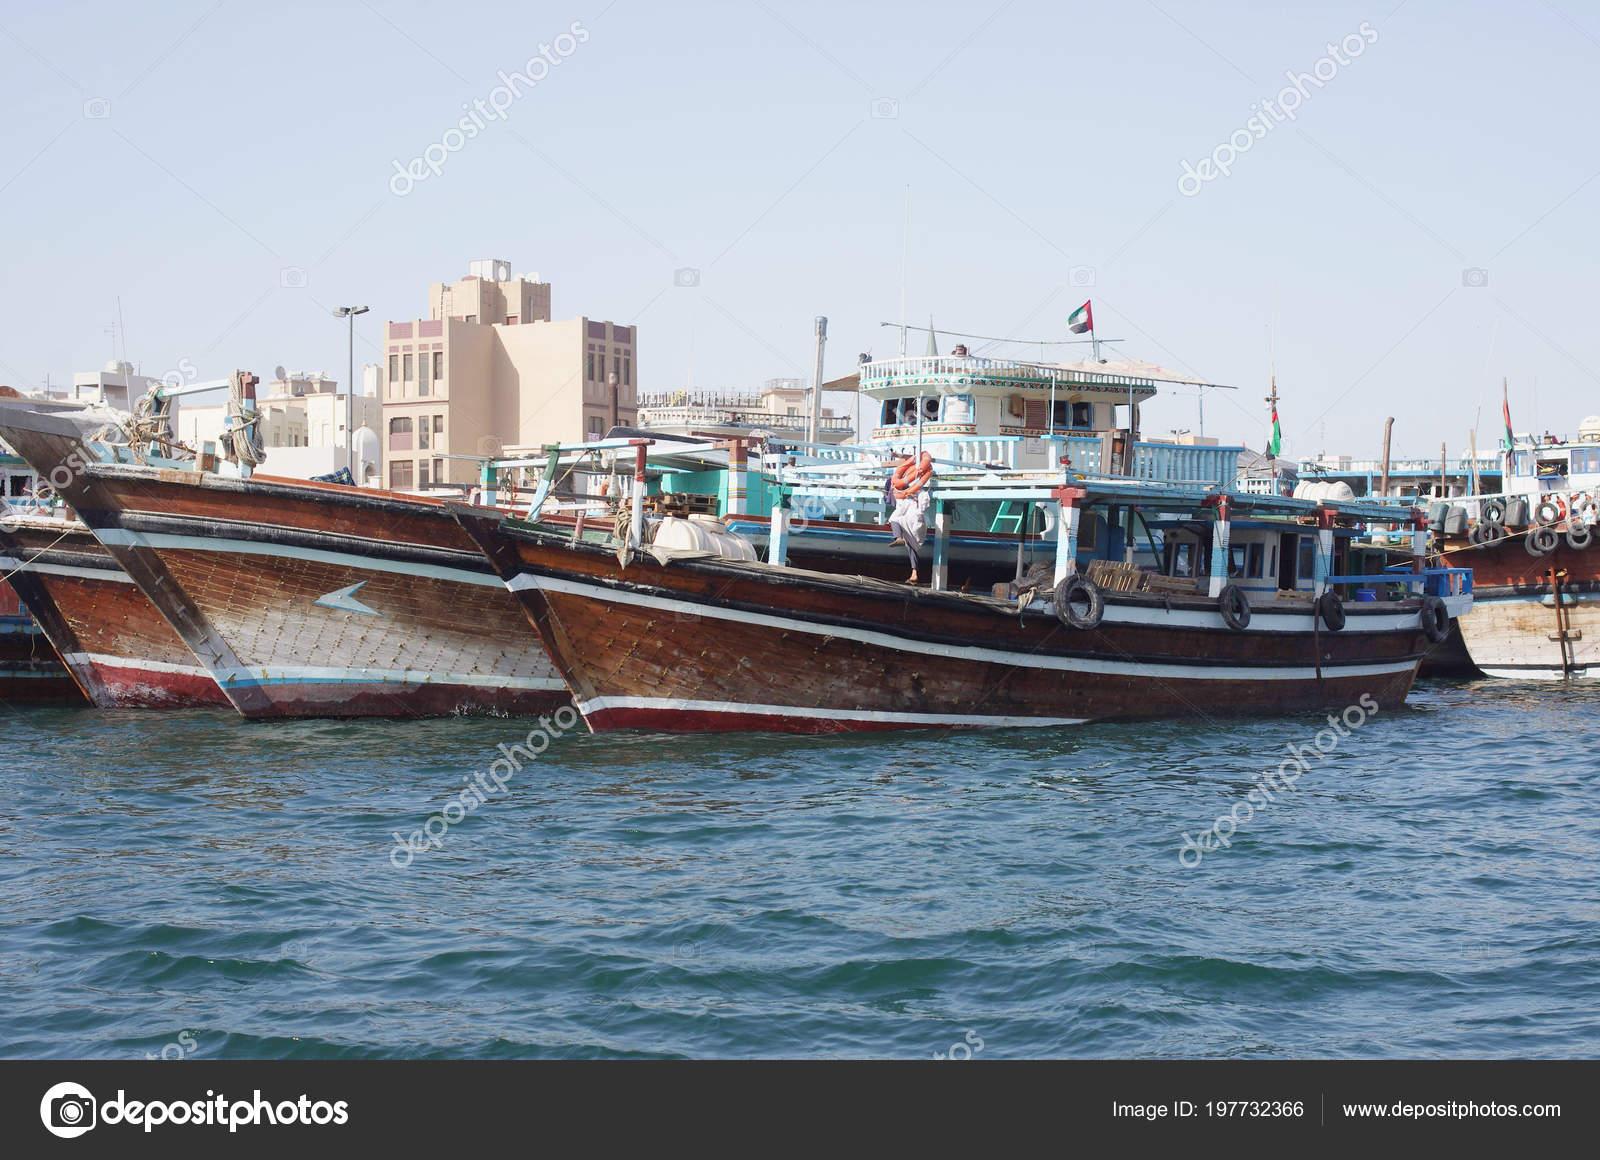 Dubai United Arab Emirates March 2018 Reverse Side Capital